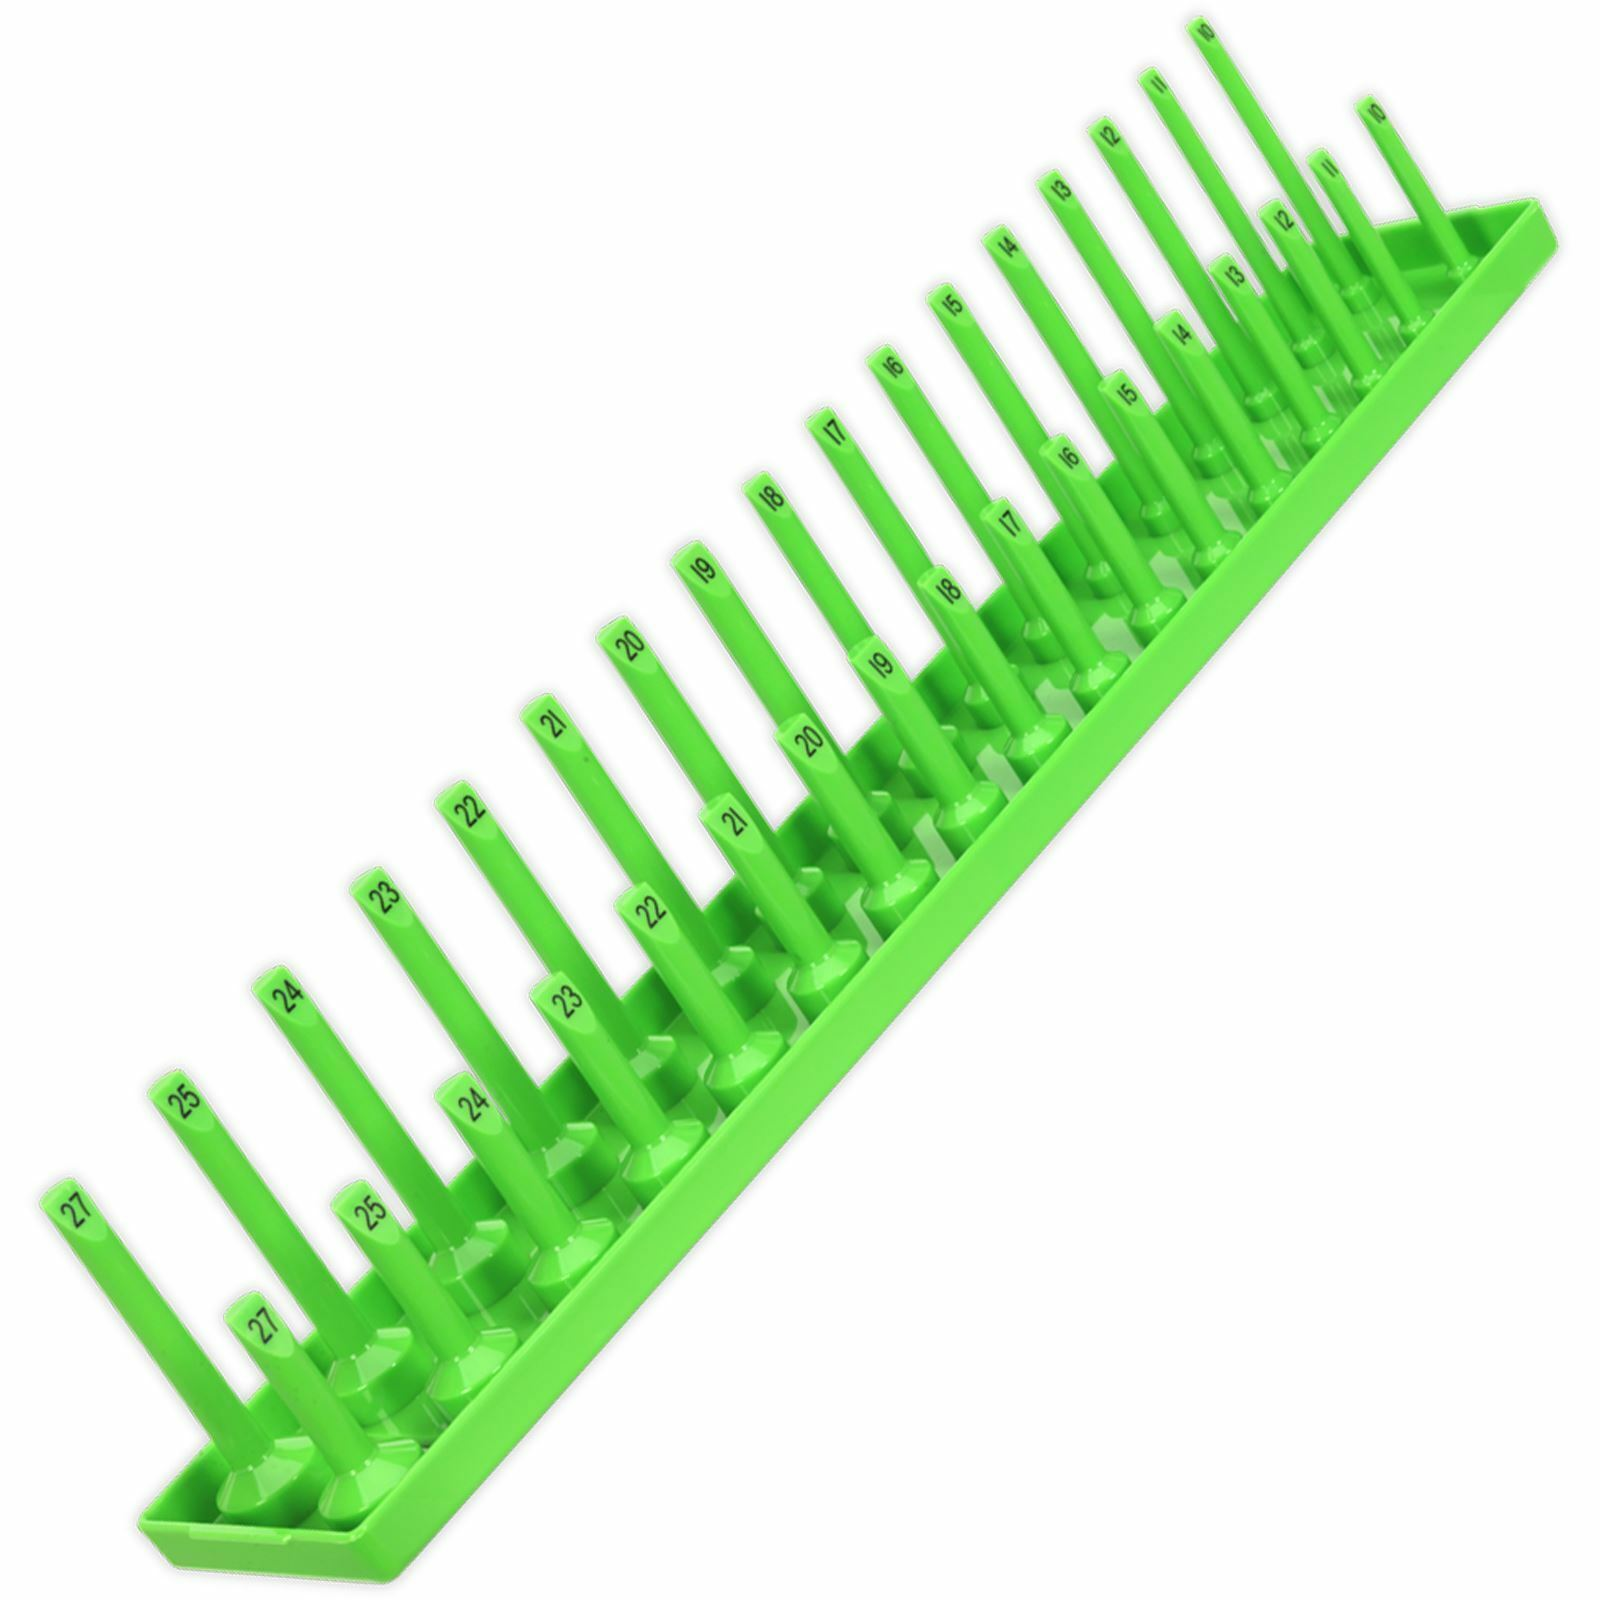 Socket Holder 1//4 Drive 4mm 15mm Hi-Vis Bright Green 230mm Length Holds 28